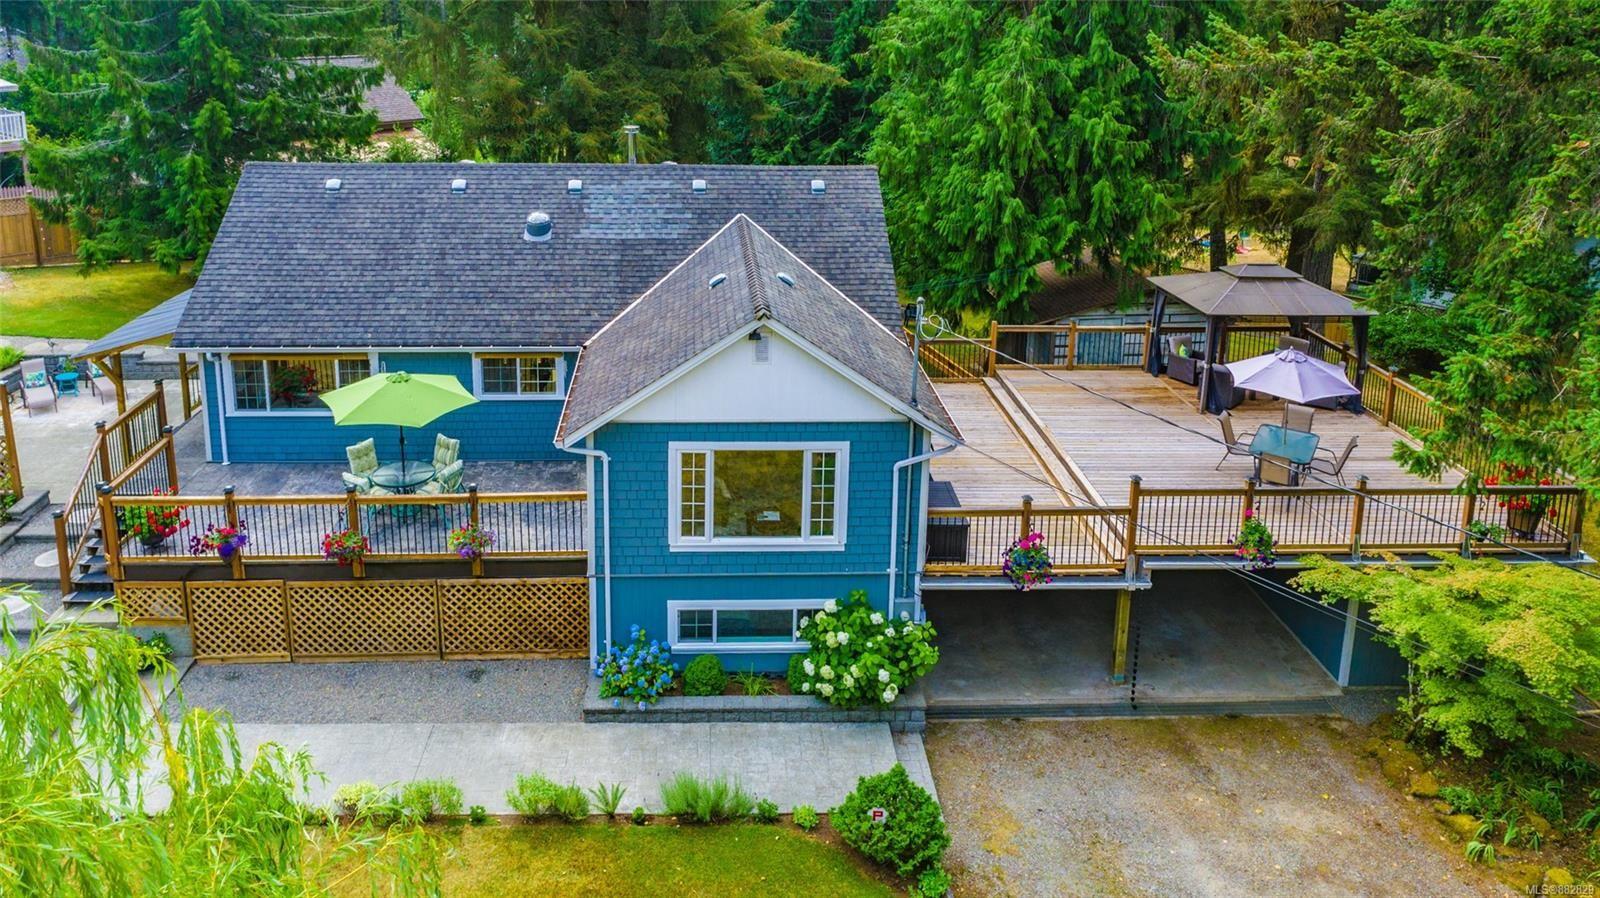 Main Photo: 8240 Dickson Dr in : PA Sproat Lake House for sale (Port Alberni)  : MLS®# 882829